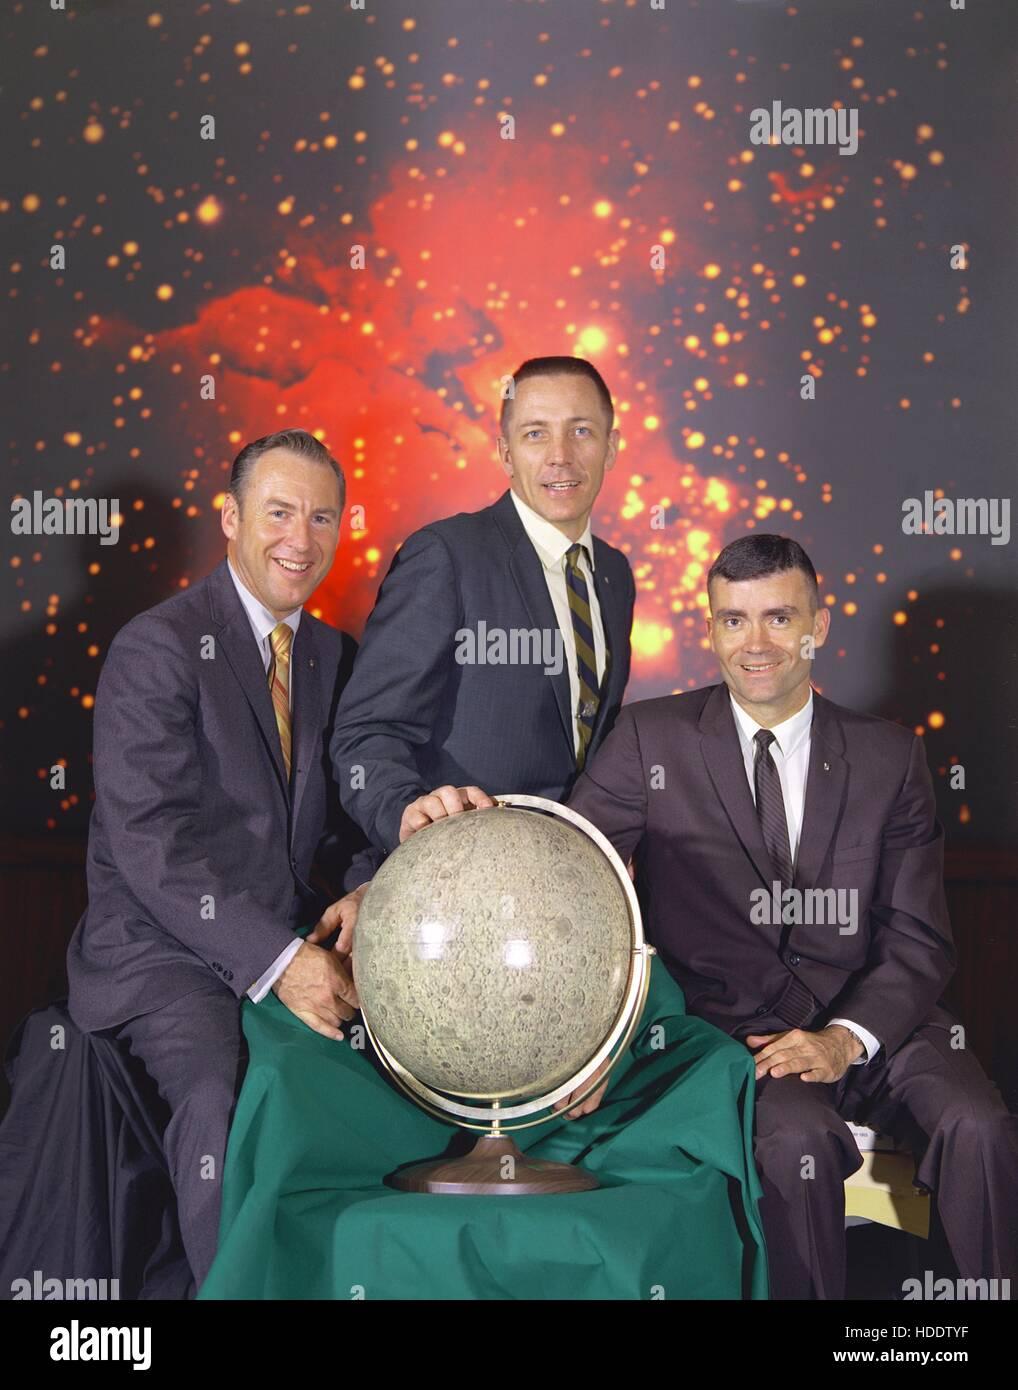 Official NASA portrait of the Apollo 13 lunar landing mission prime crew members (L-R) astronauts Jim Lovell, Jack - Stock Image